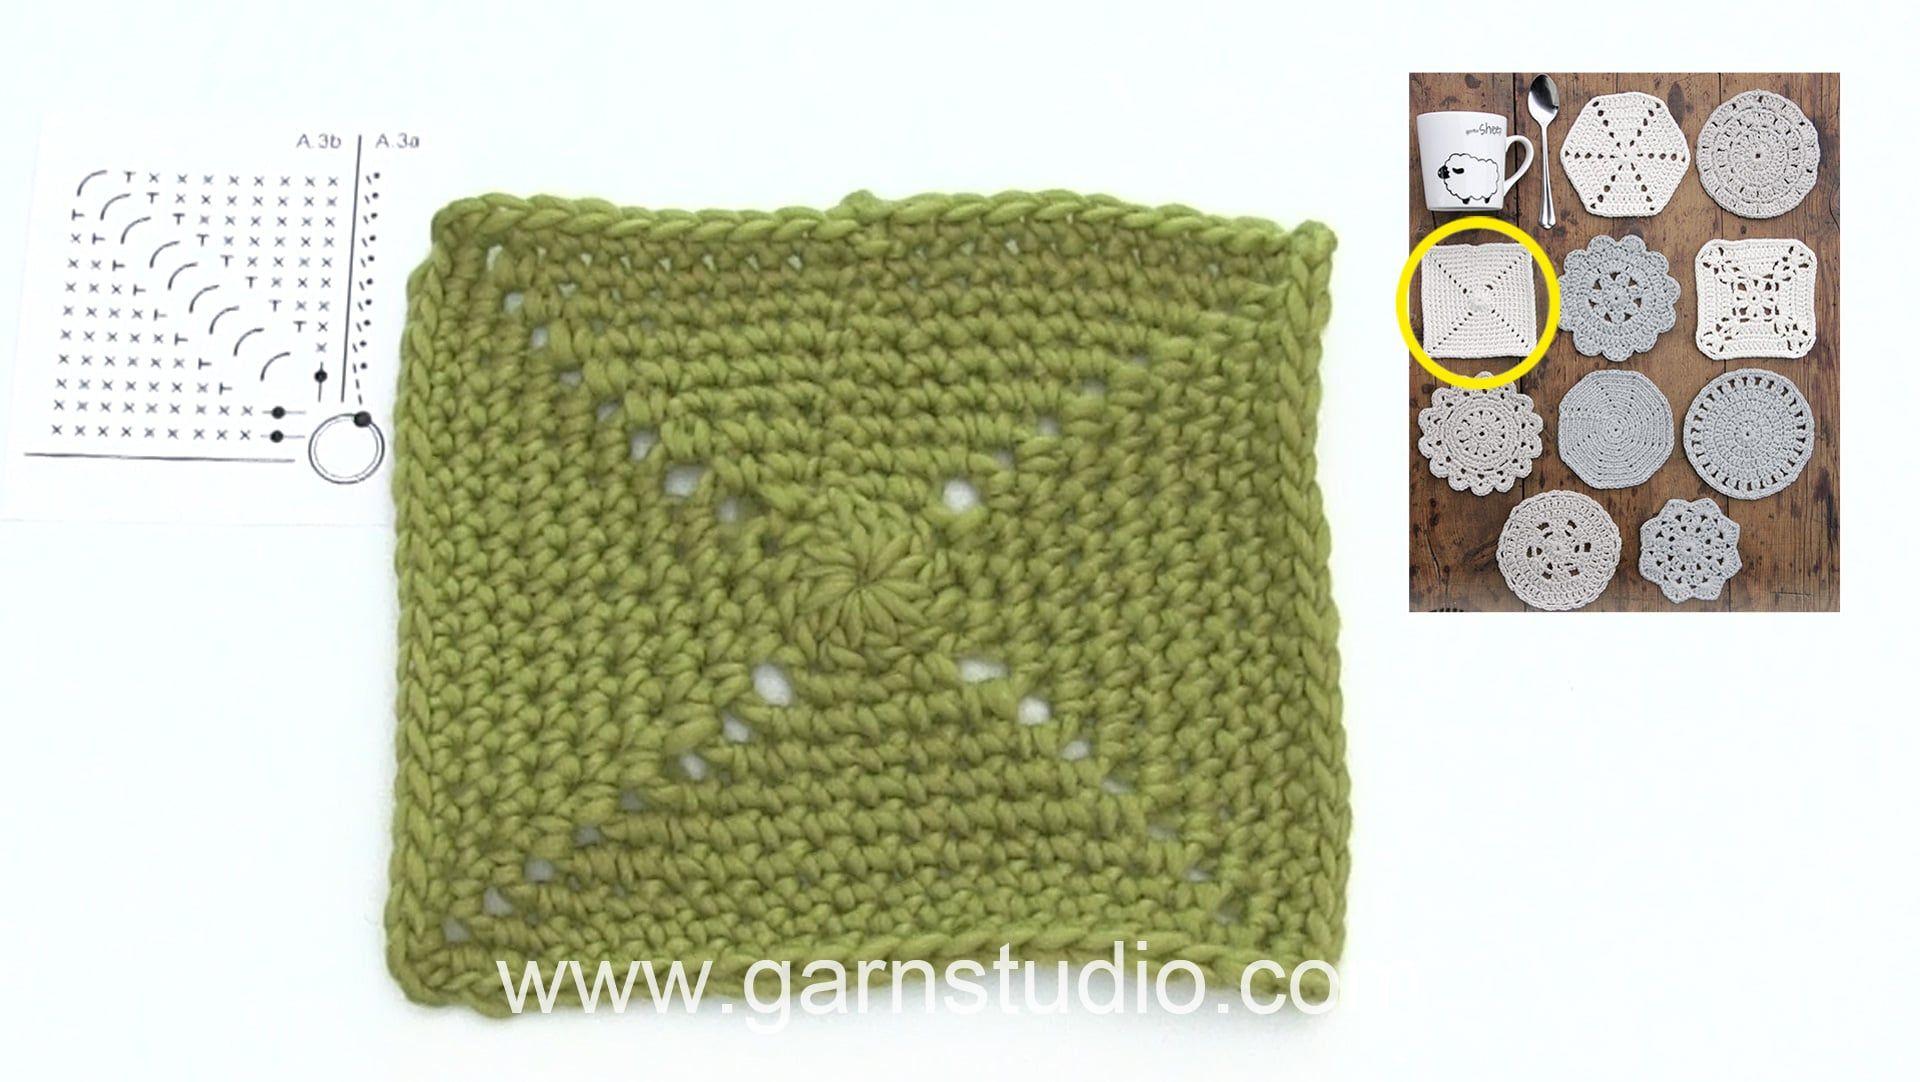 How To Crochet A Coaster Free Crochet Pattern Drops Extra 0 1403